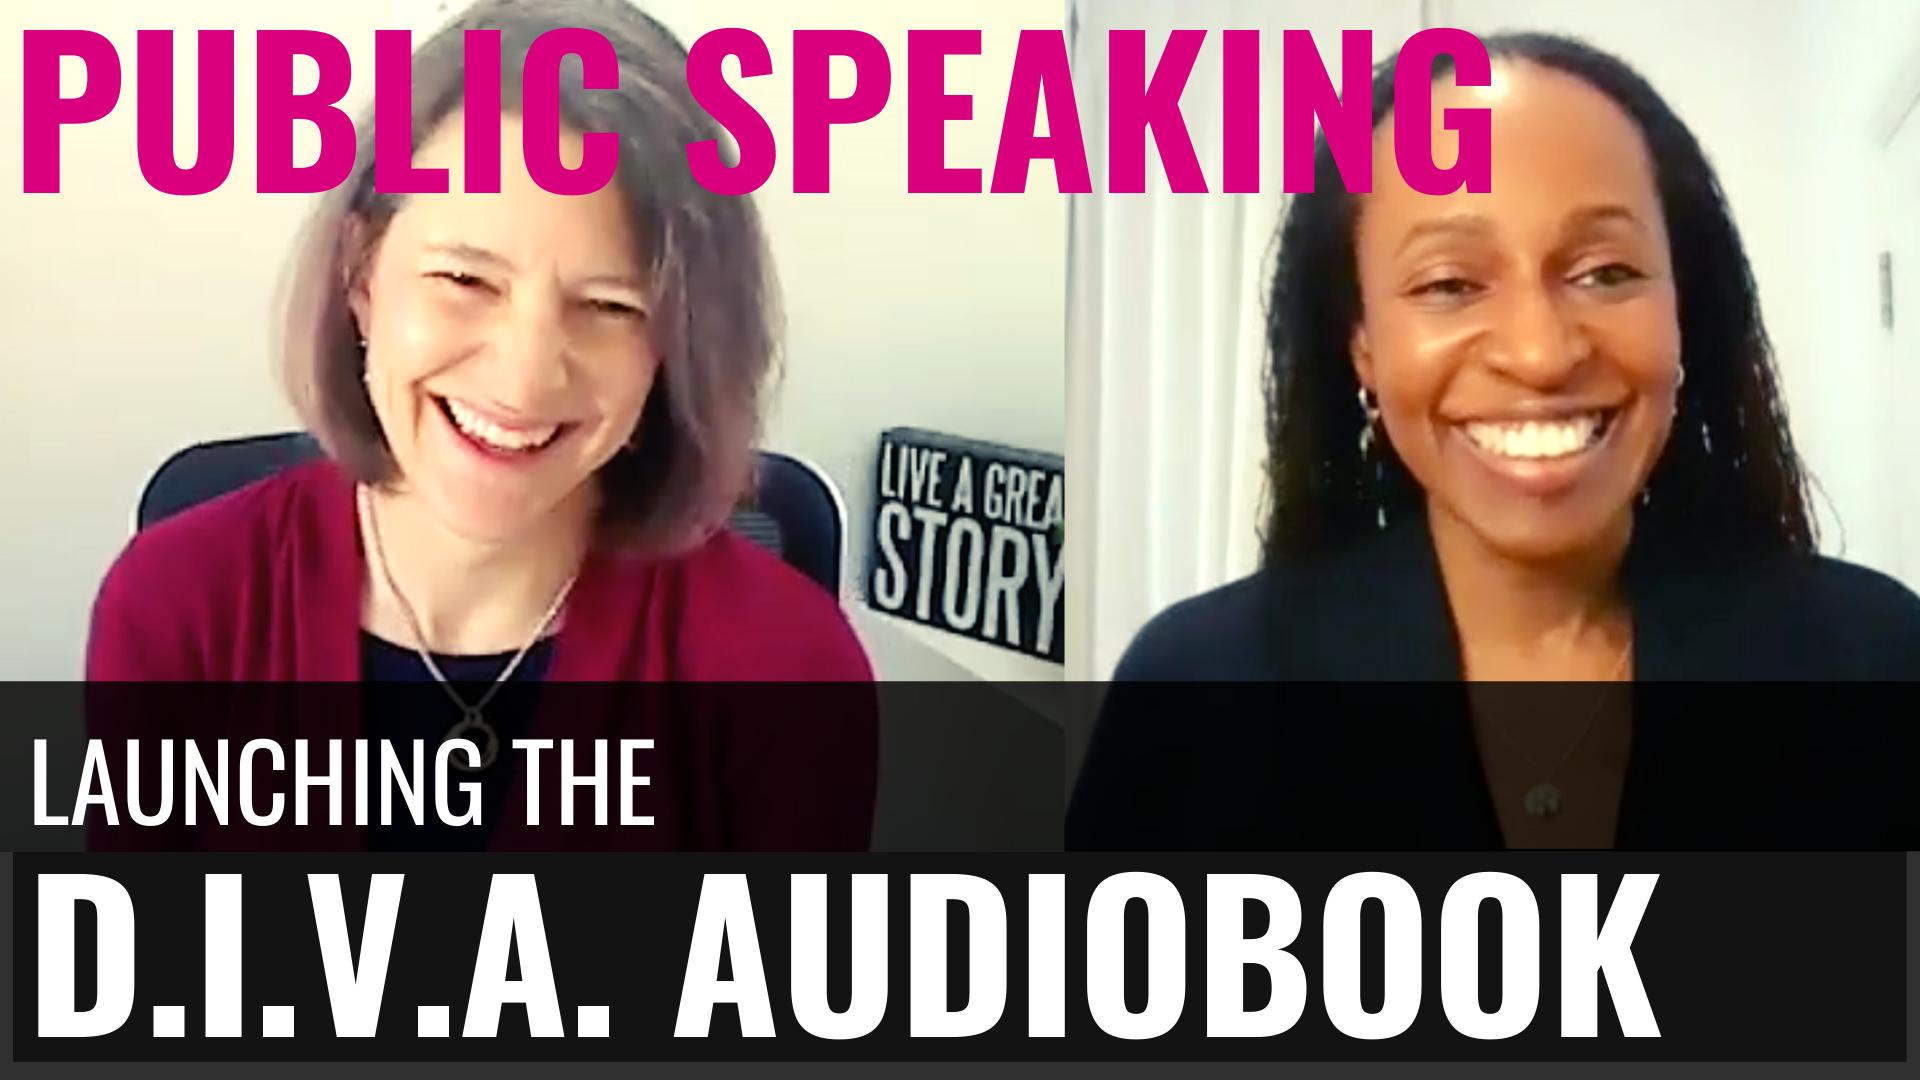 Interview with Audiobook Narrator Kristin Aiken Salada